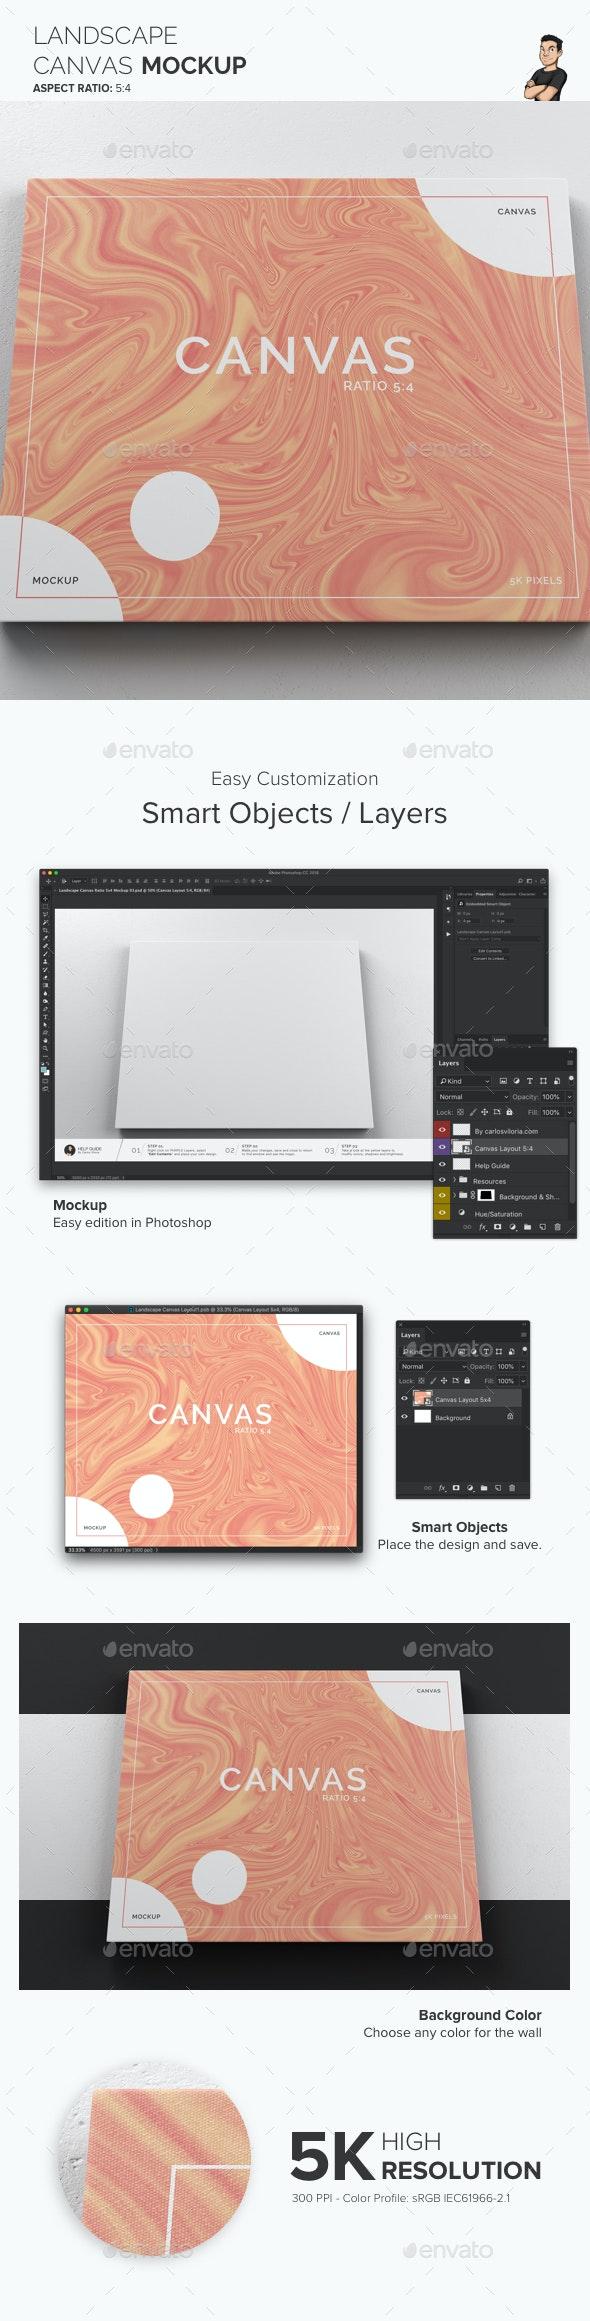 Landscape Canvas Ratio 5x4 Mockup 03 - Print Product Mock-Ups